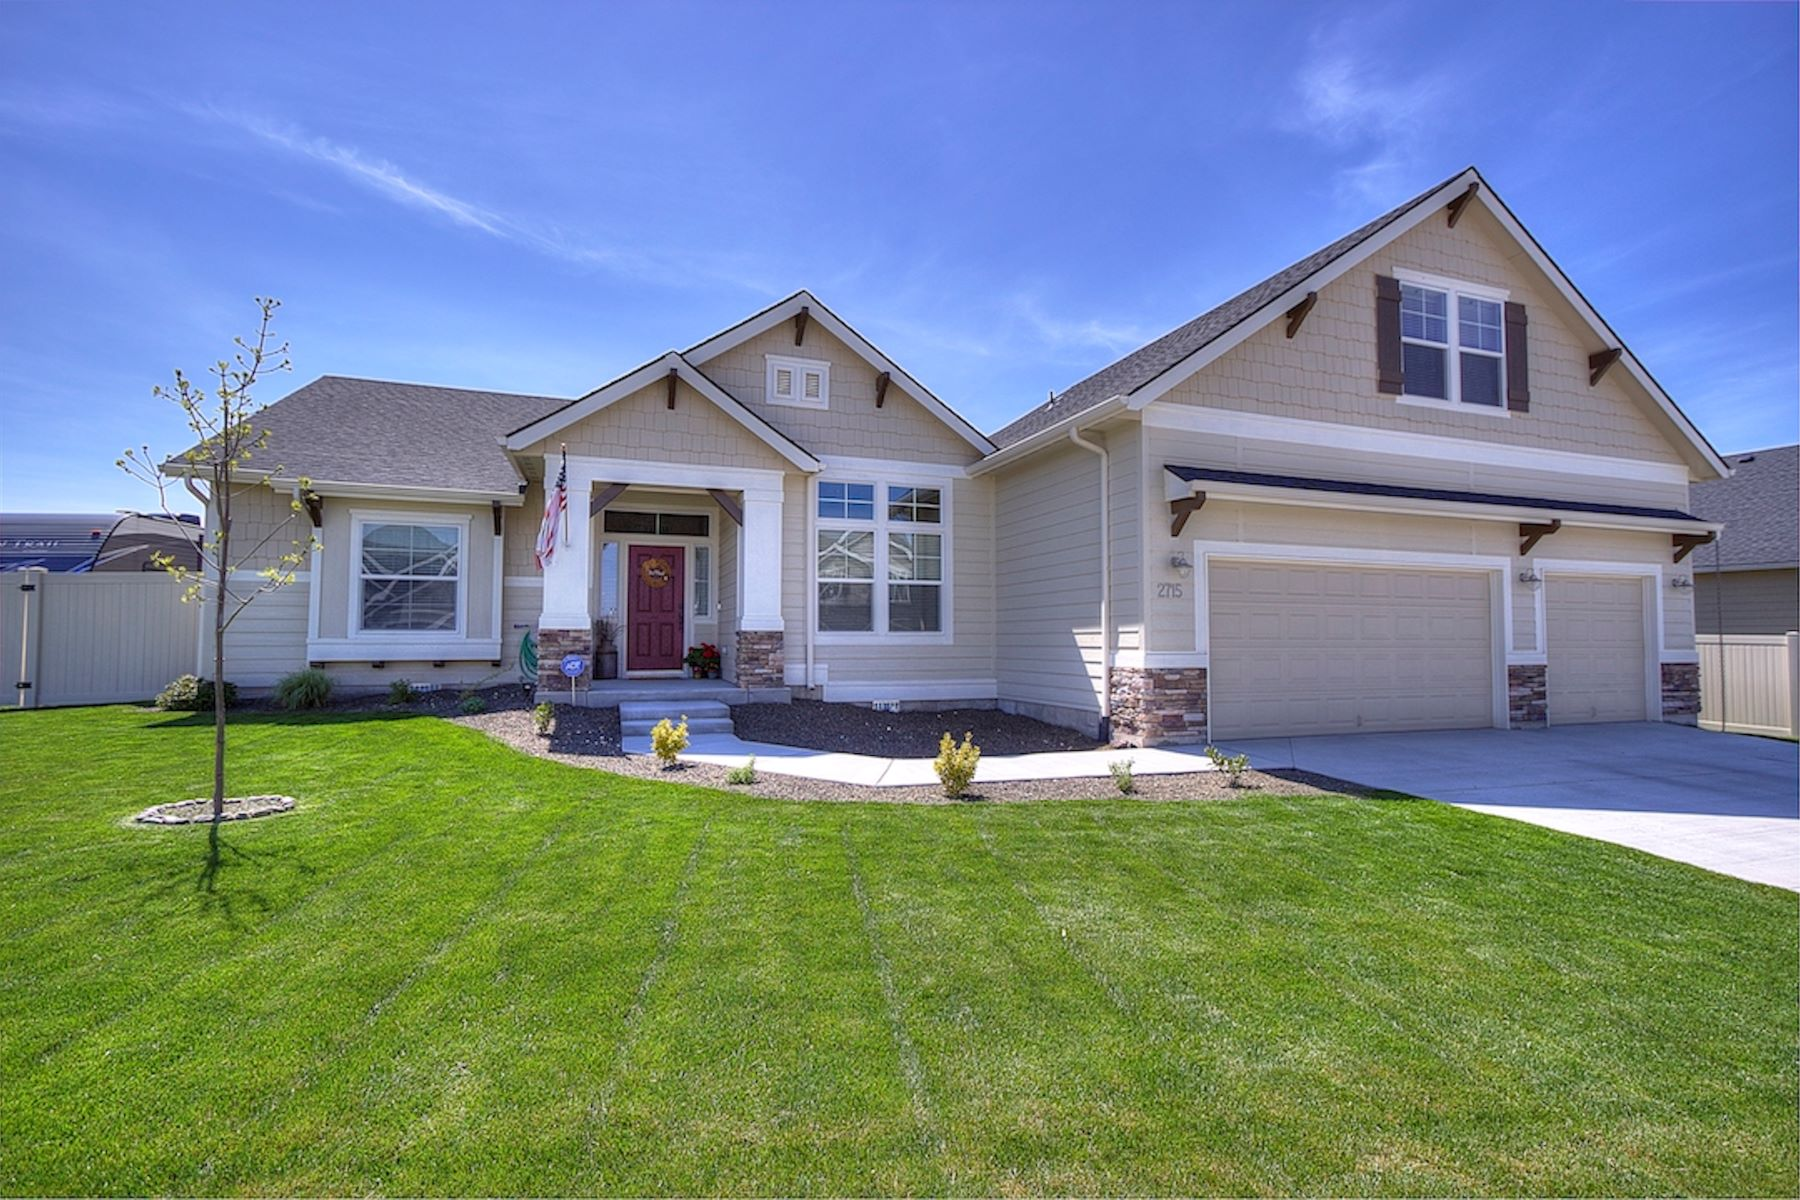 Single Family Home for Active at 2715 Aquamarine St., Kuna 2715 W Aquamarine St Kuna, Idaho 83634 United States